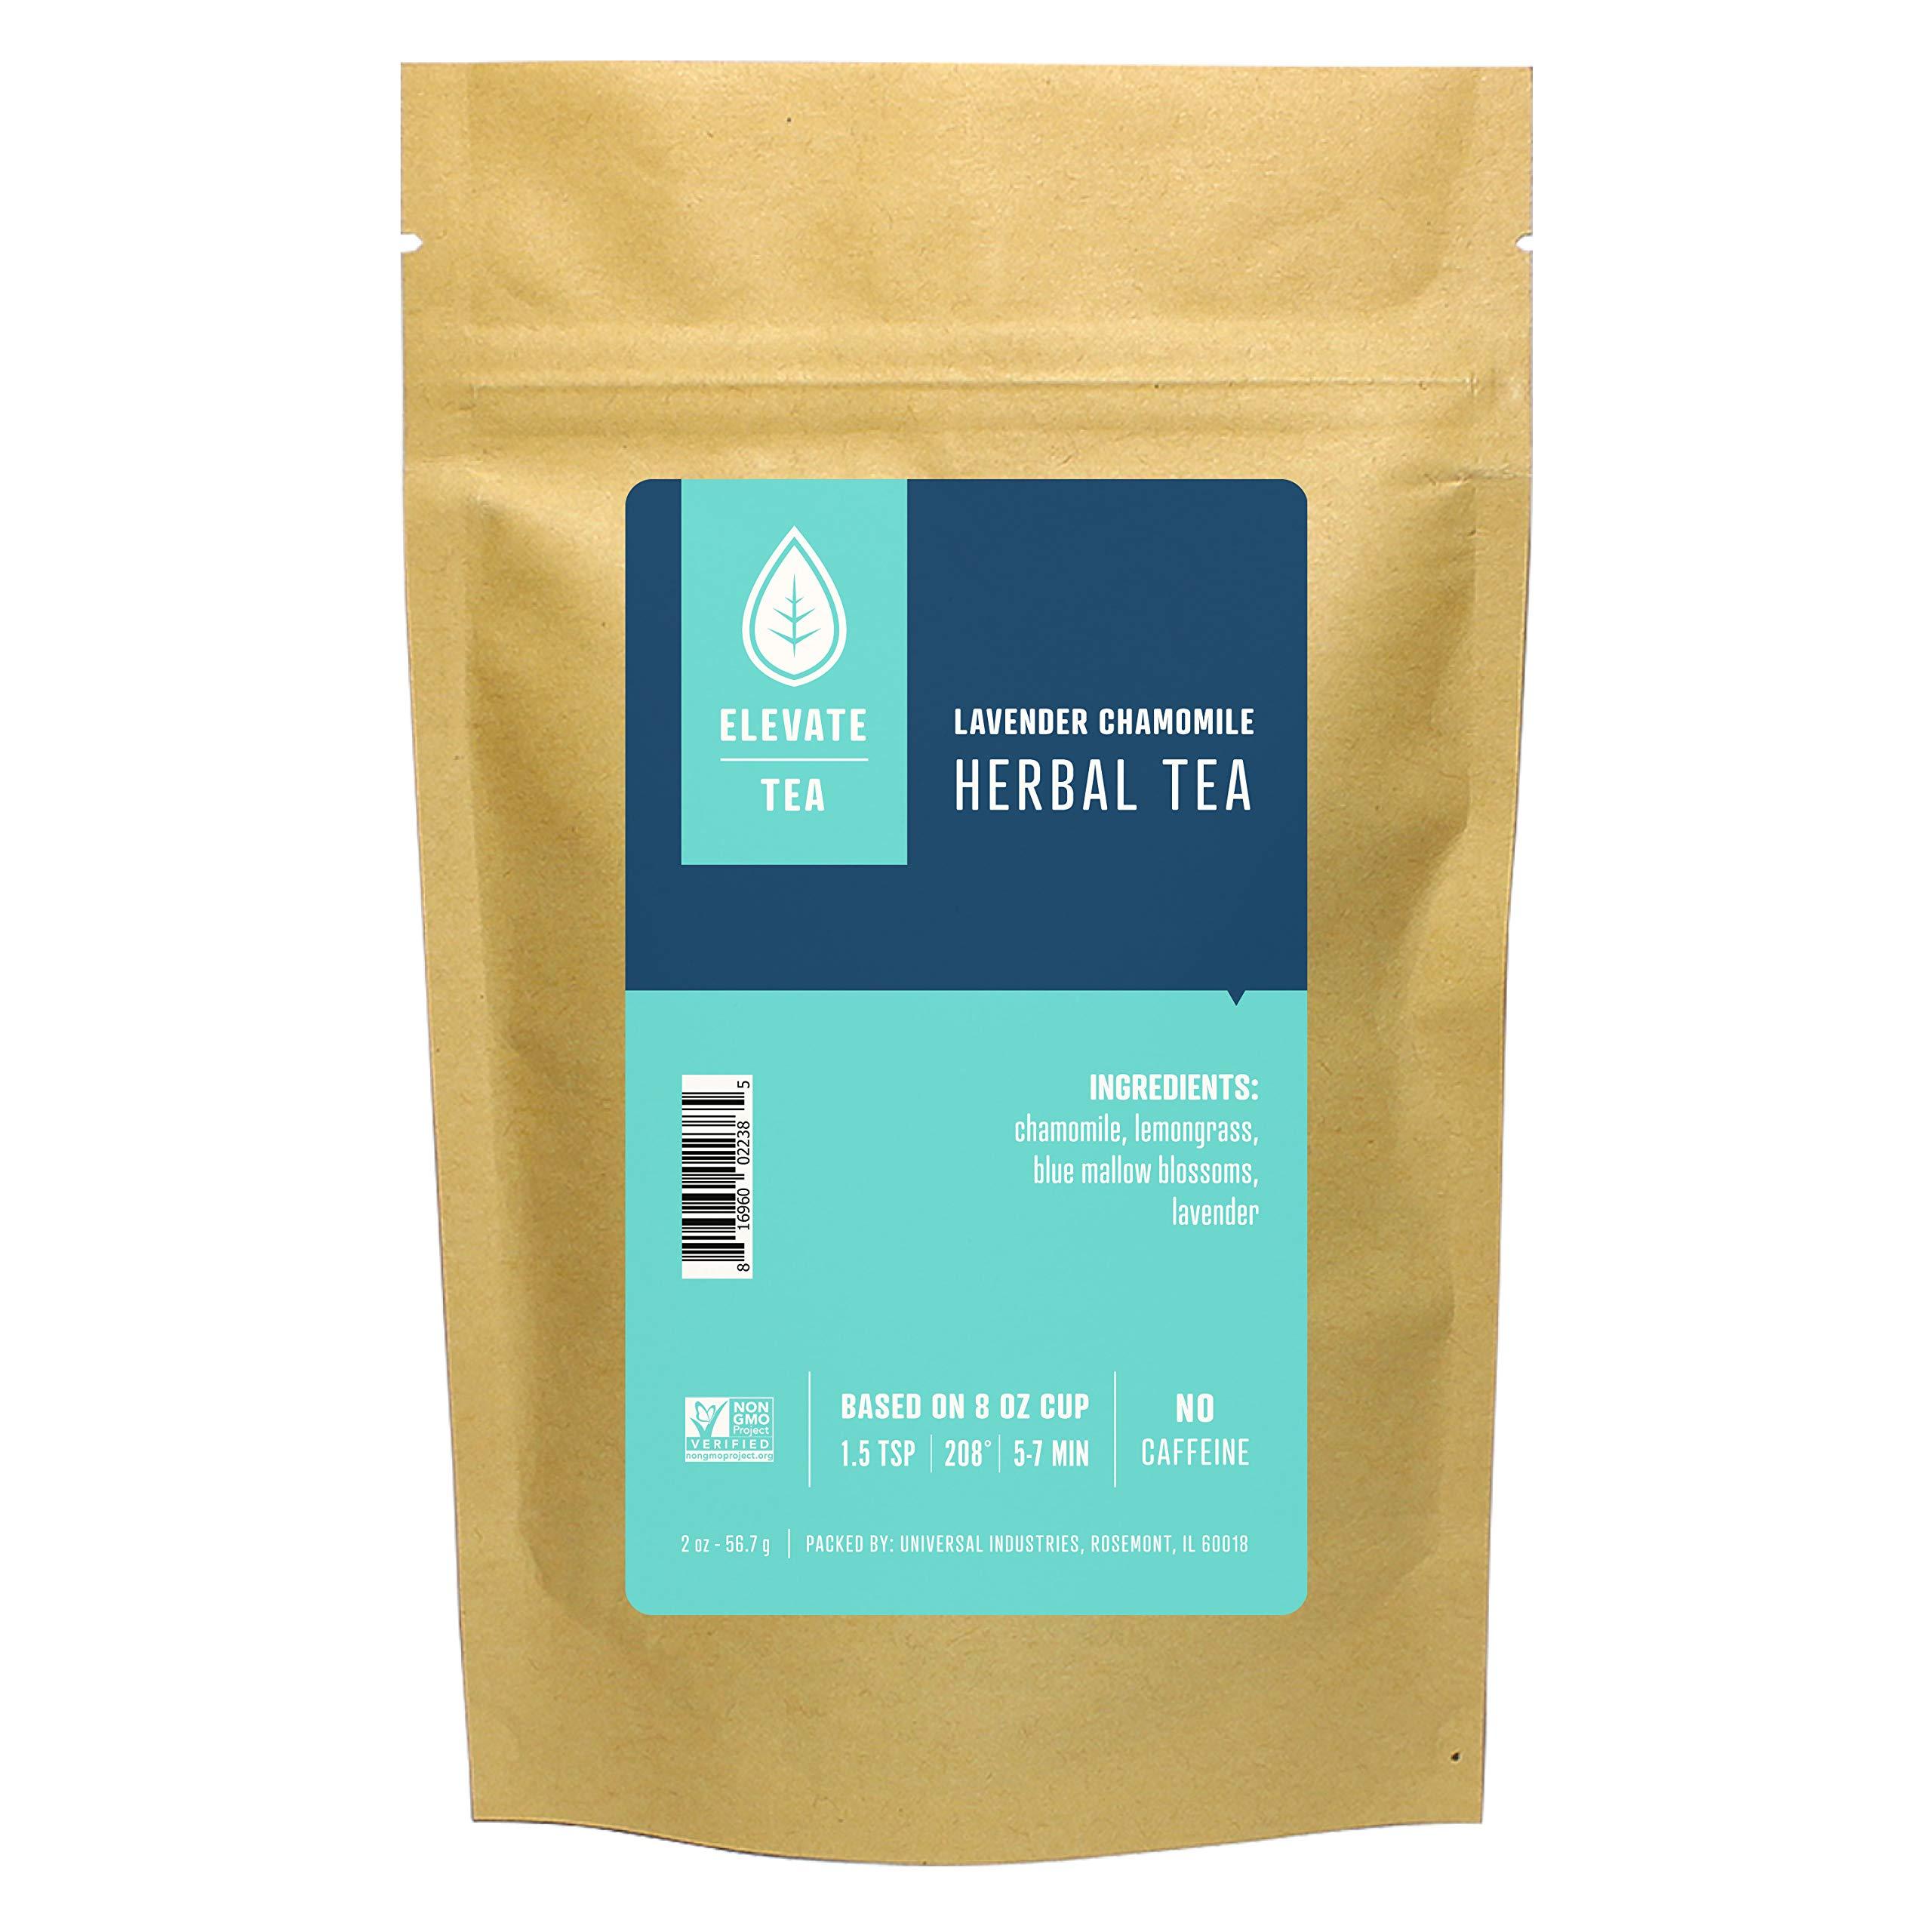 Elevate Tea LAVENDER CHAMOMILE HERBAL TEA, Loose Leaf Tea Blend, 25 servings, 2 Ounce Pouch, Caffeine Level: None